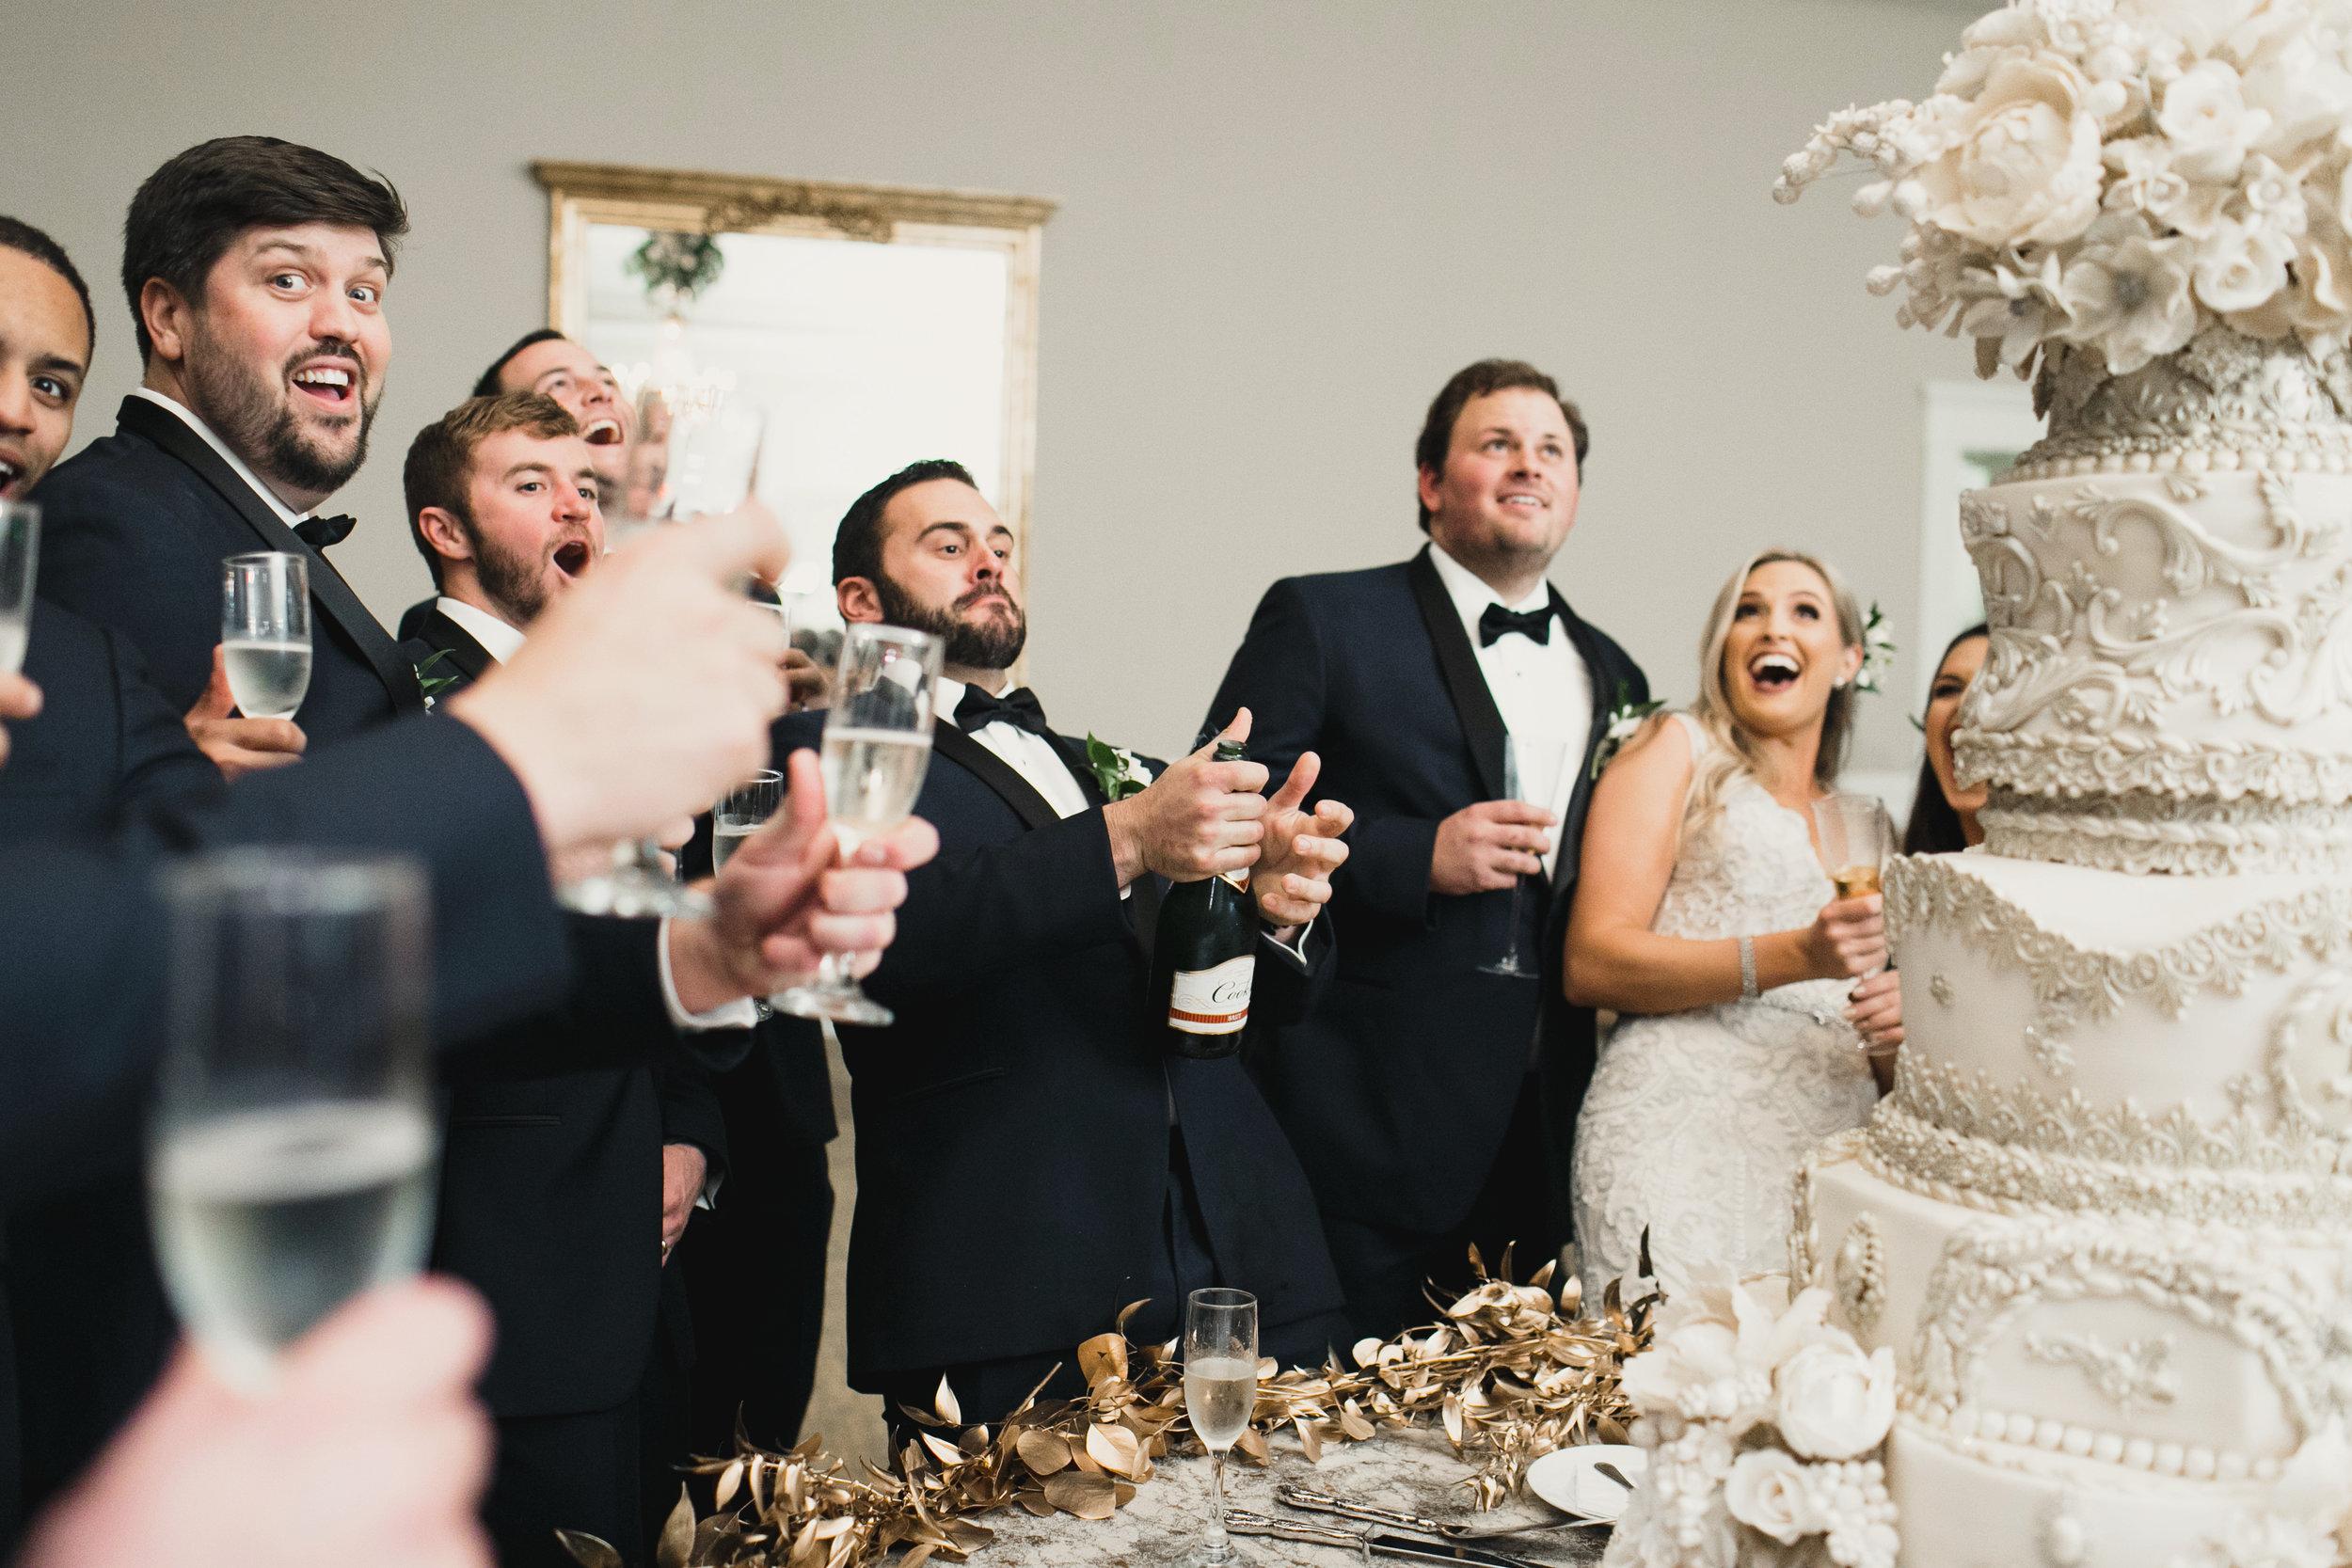 Southern Fete, Southern Wedding, Le Pavillon, Phunky Monkey, Occasions by Gwen, Kimbrali Photography